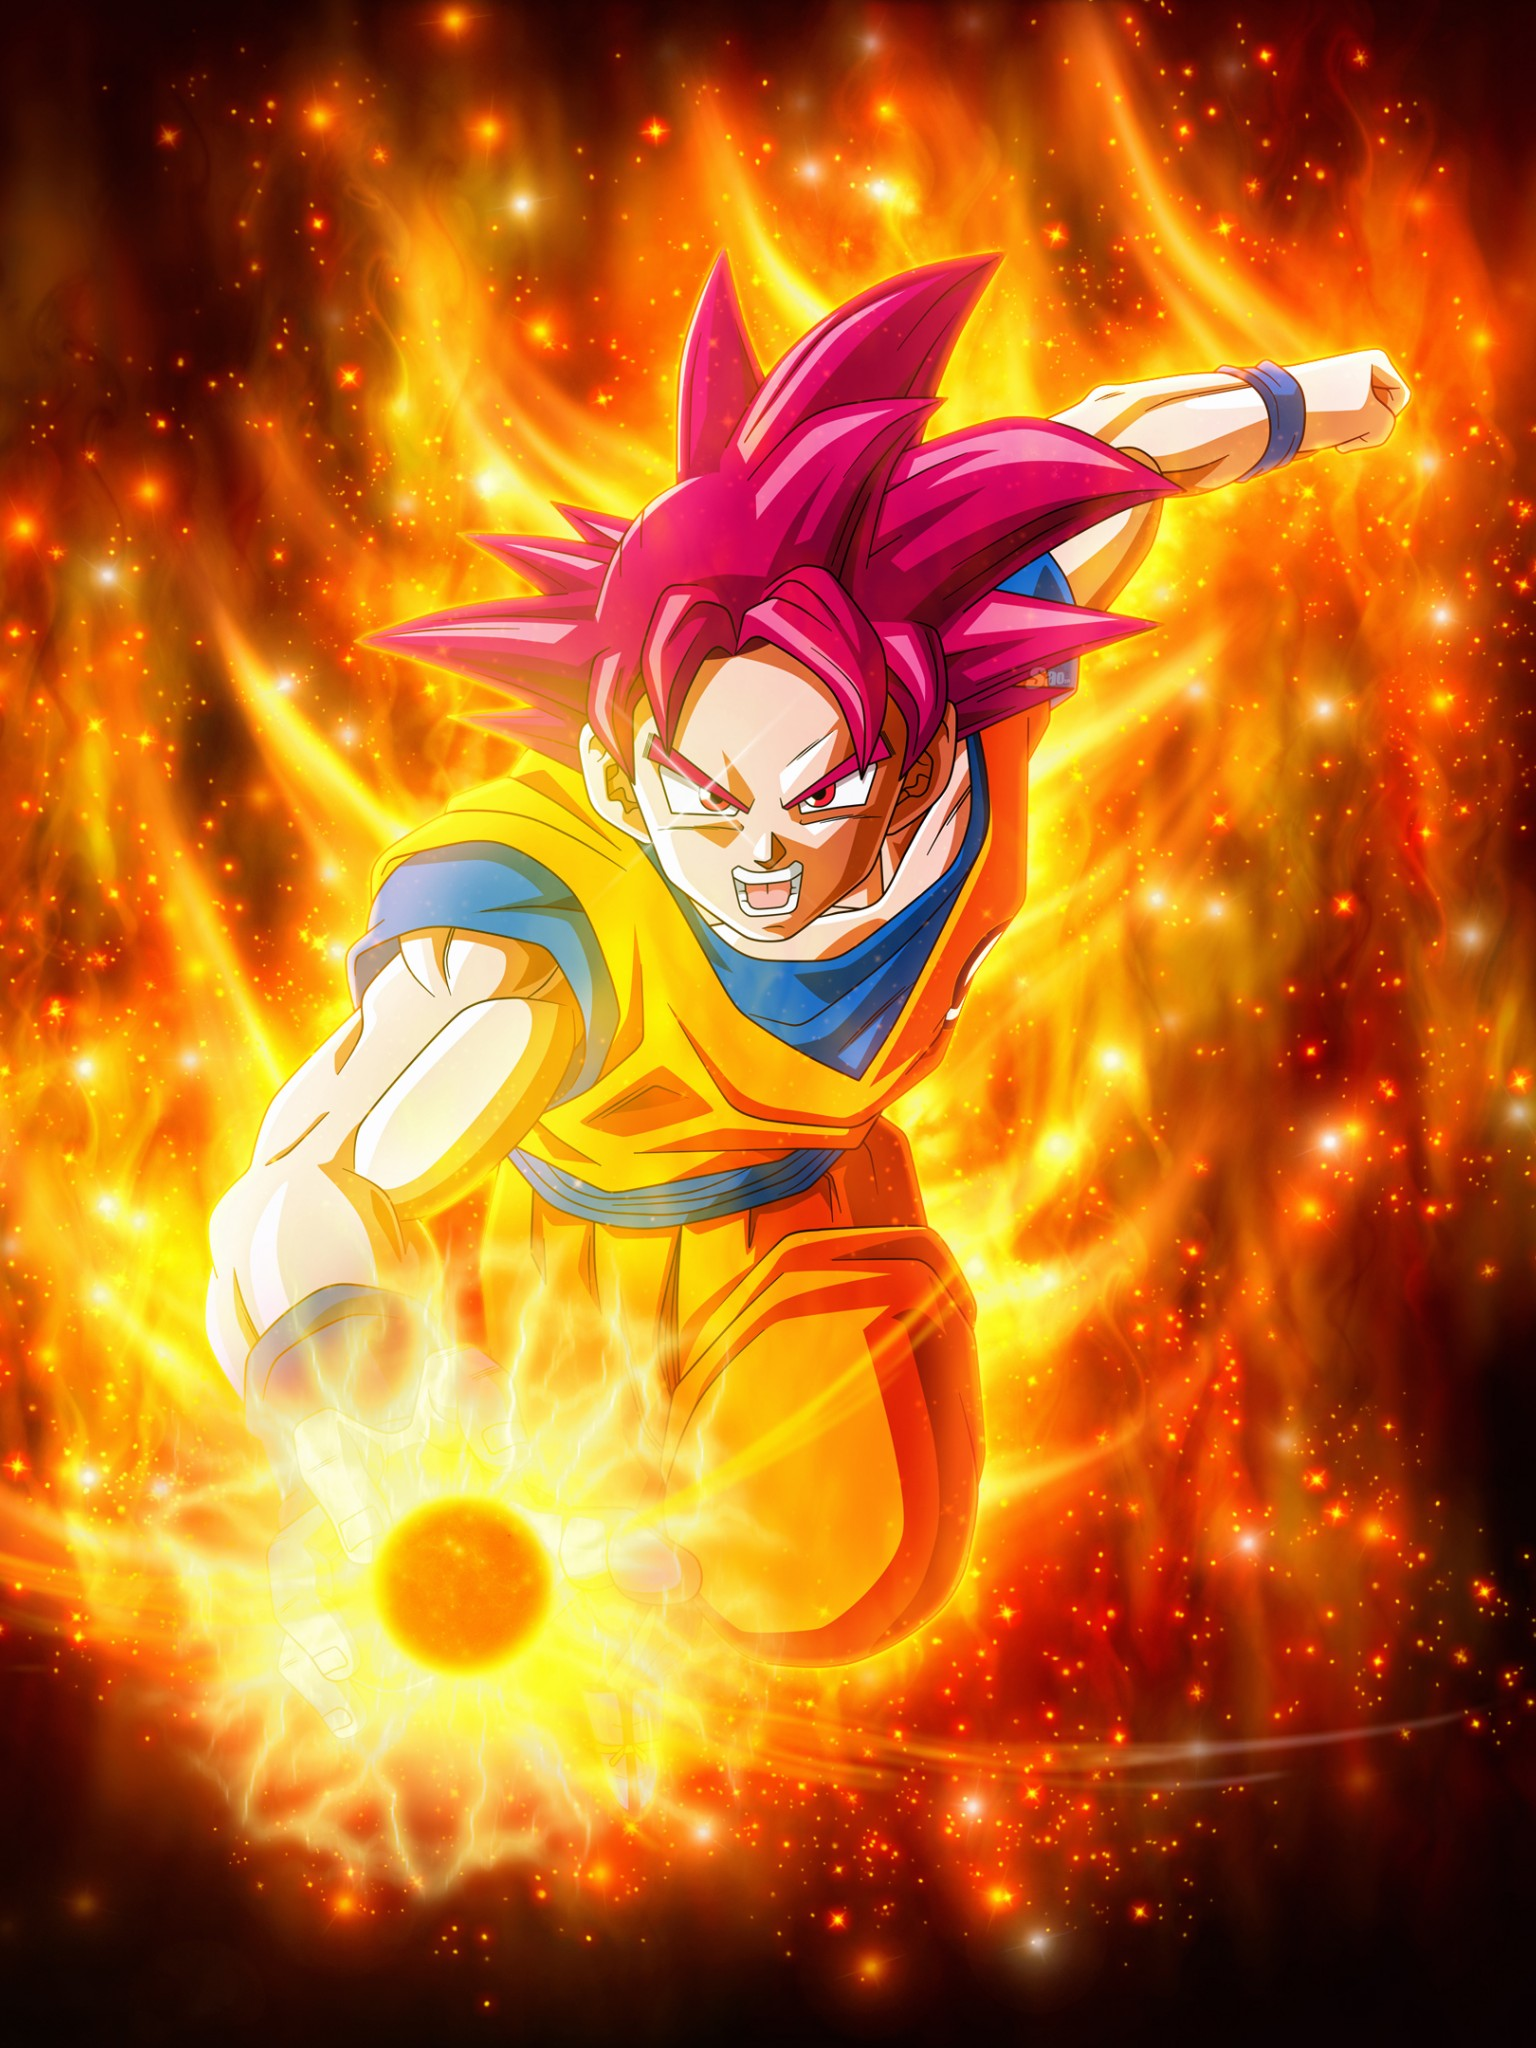 Super Saiyan Goku Dragon Ball Super Super 4k Retina Ipad